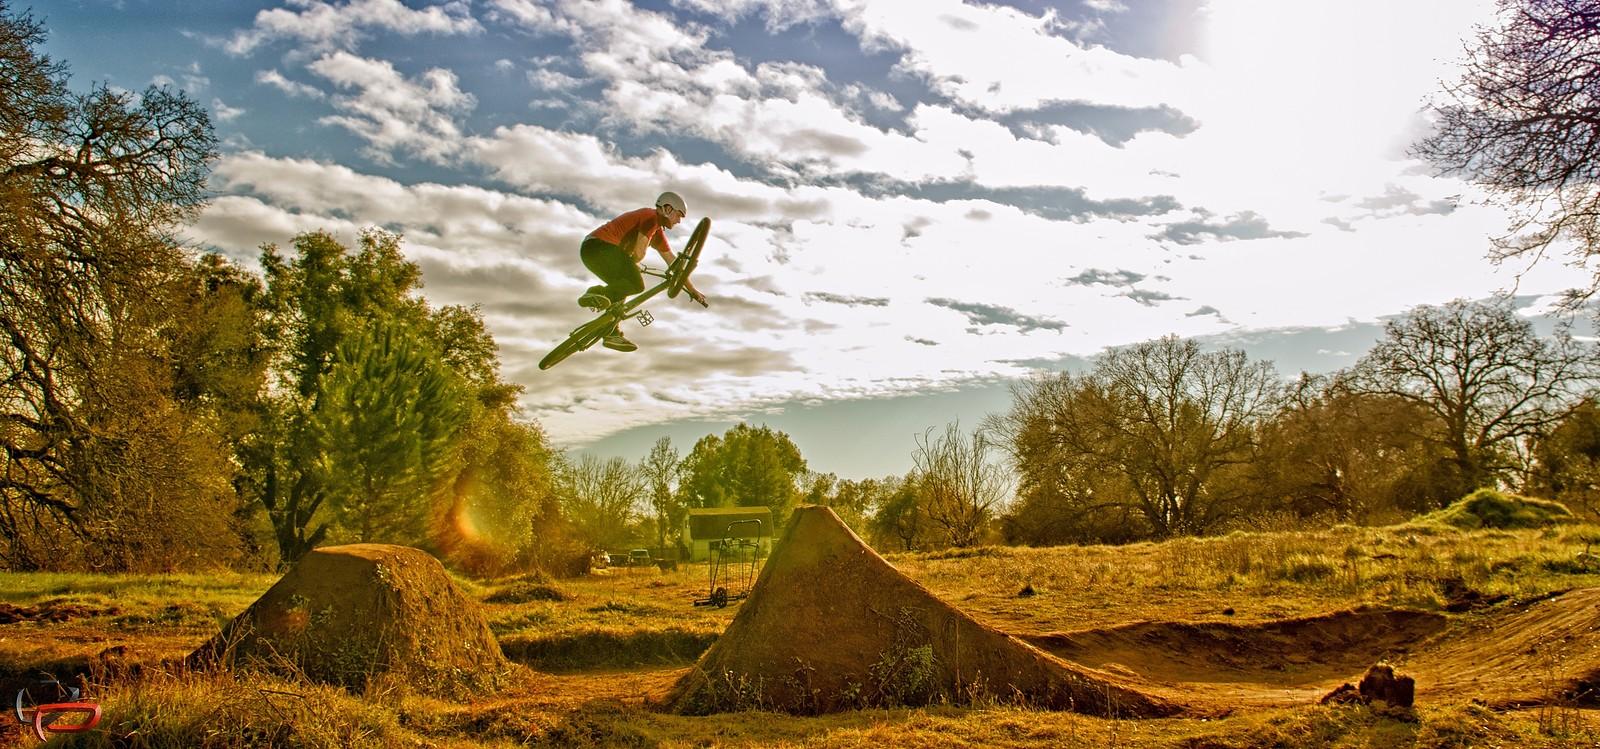 Chipper   - vividphotography2011 - Mountain Biking Pictures - Vital MTB